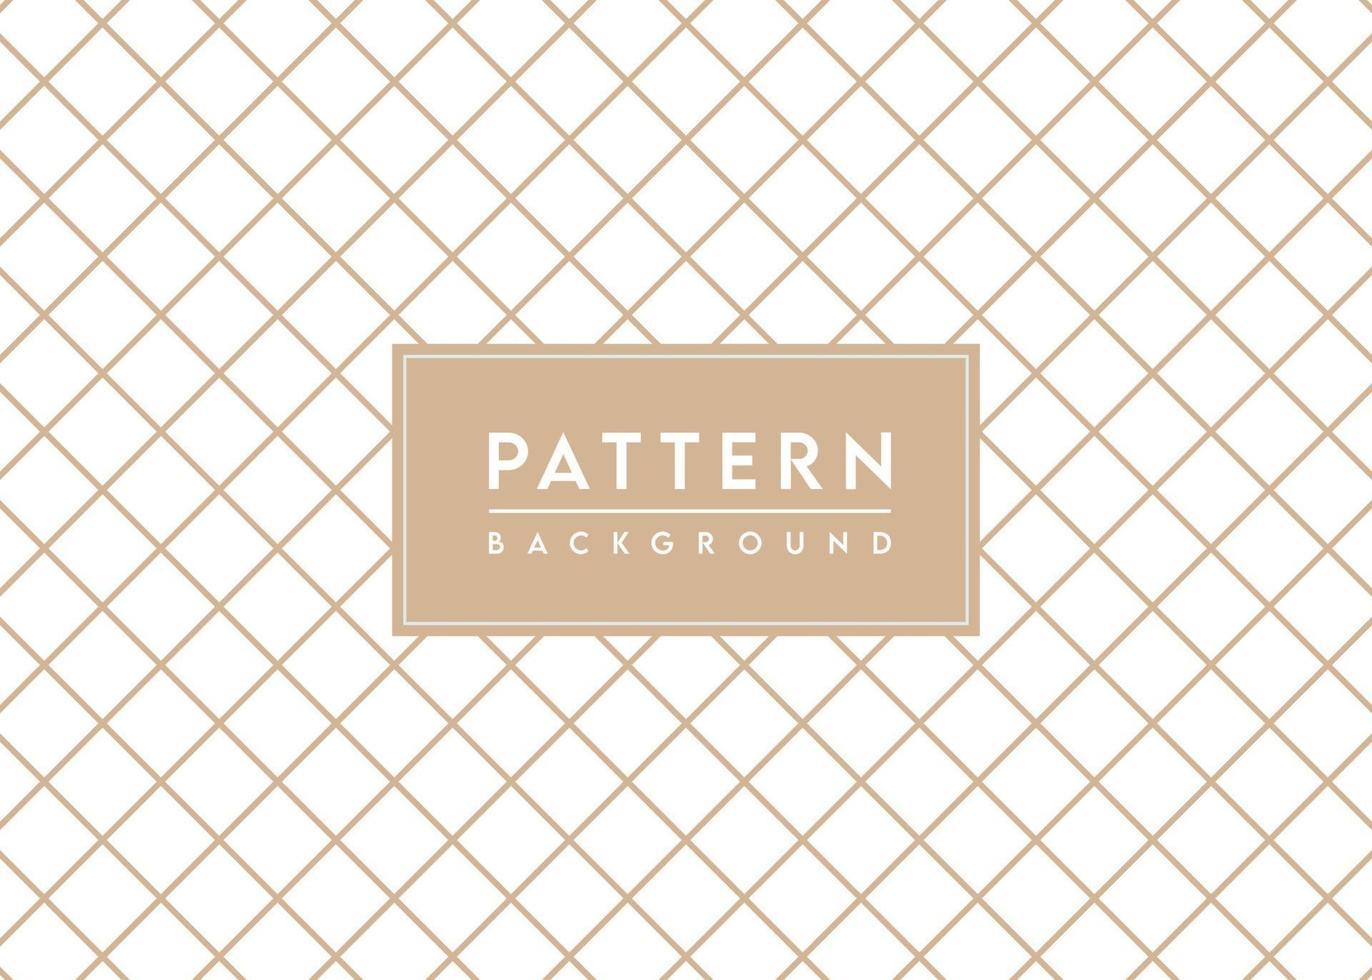 Crossed Lines Pattern Background Textured Vector Design